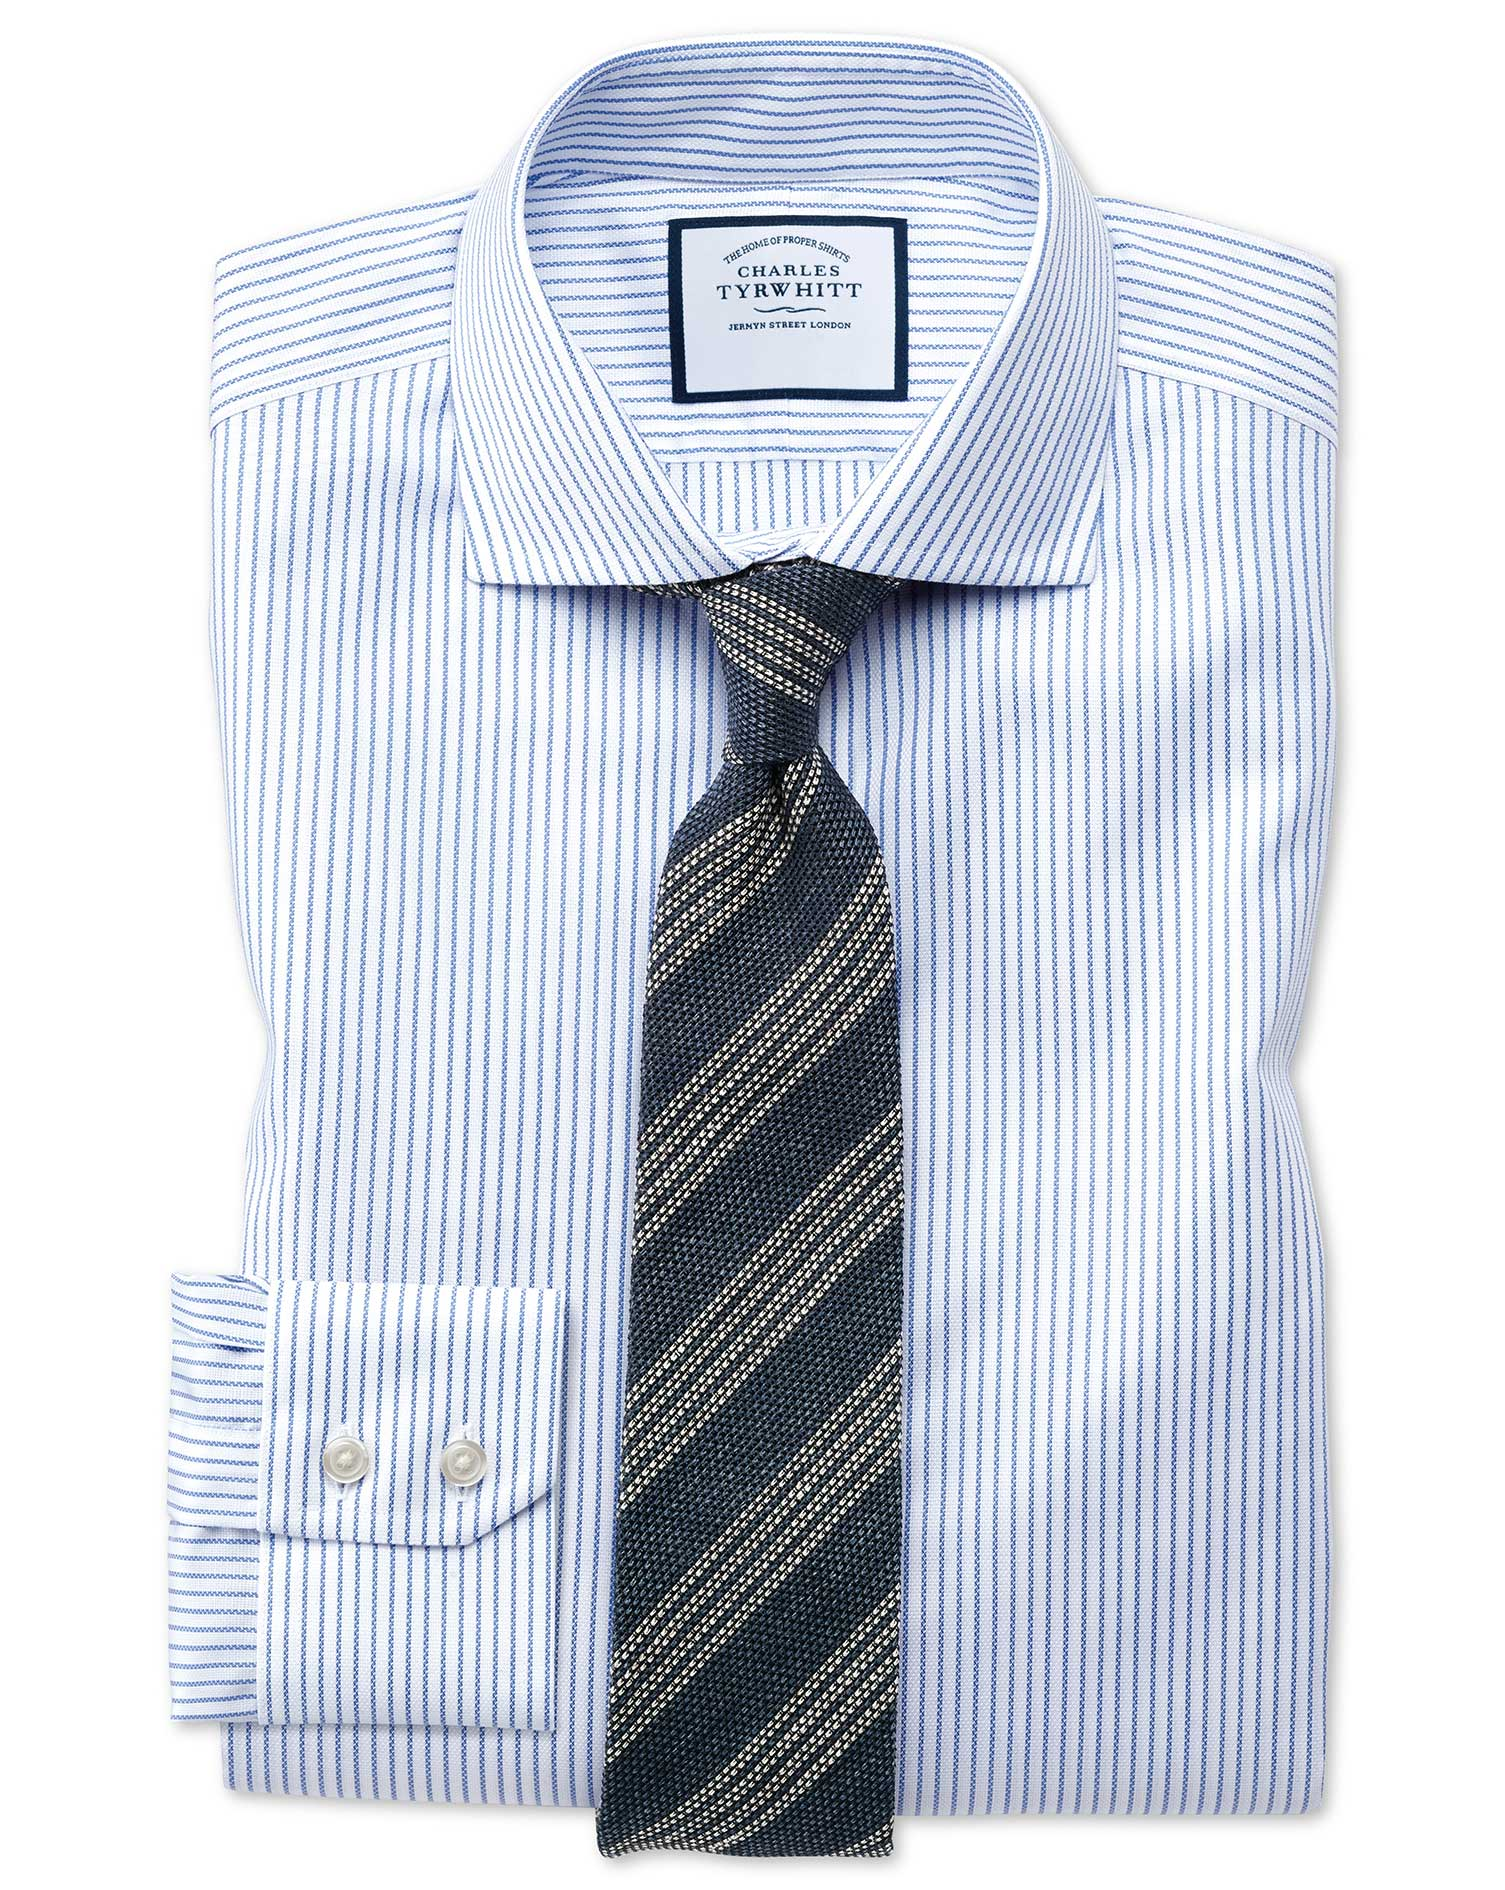 Slim Fit Cutaway Collar Non-Iron Cotton Stretch Oxford Stripe Blue and White Formal Shirt Single Cuf